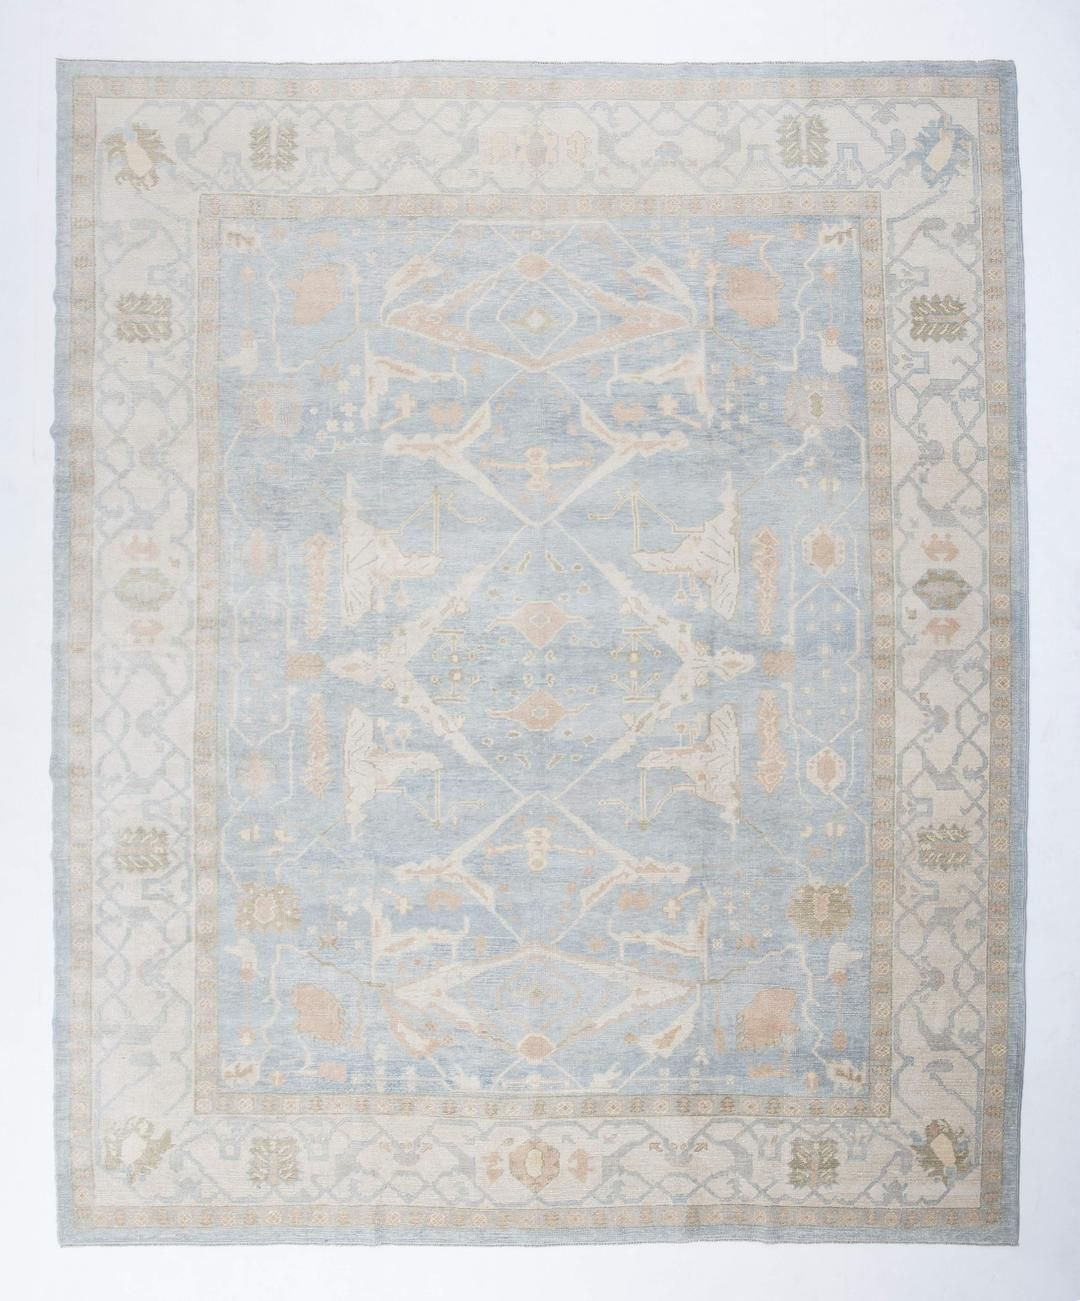 11x14 Slate Gray Modern Oushak Area Rug Turkish Rugs Oriental Rugs